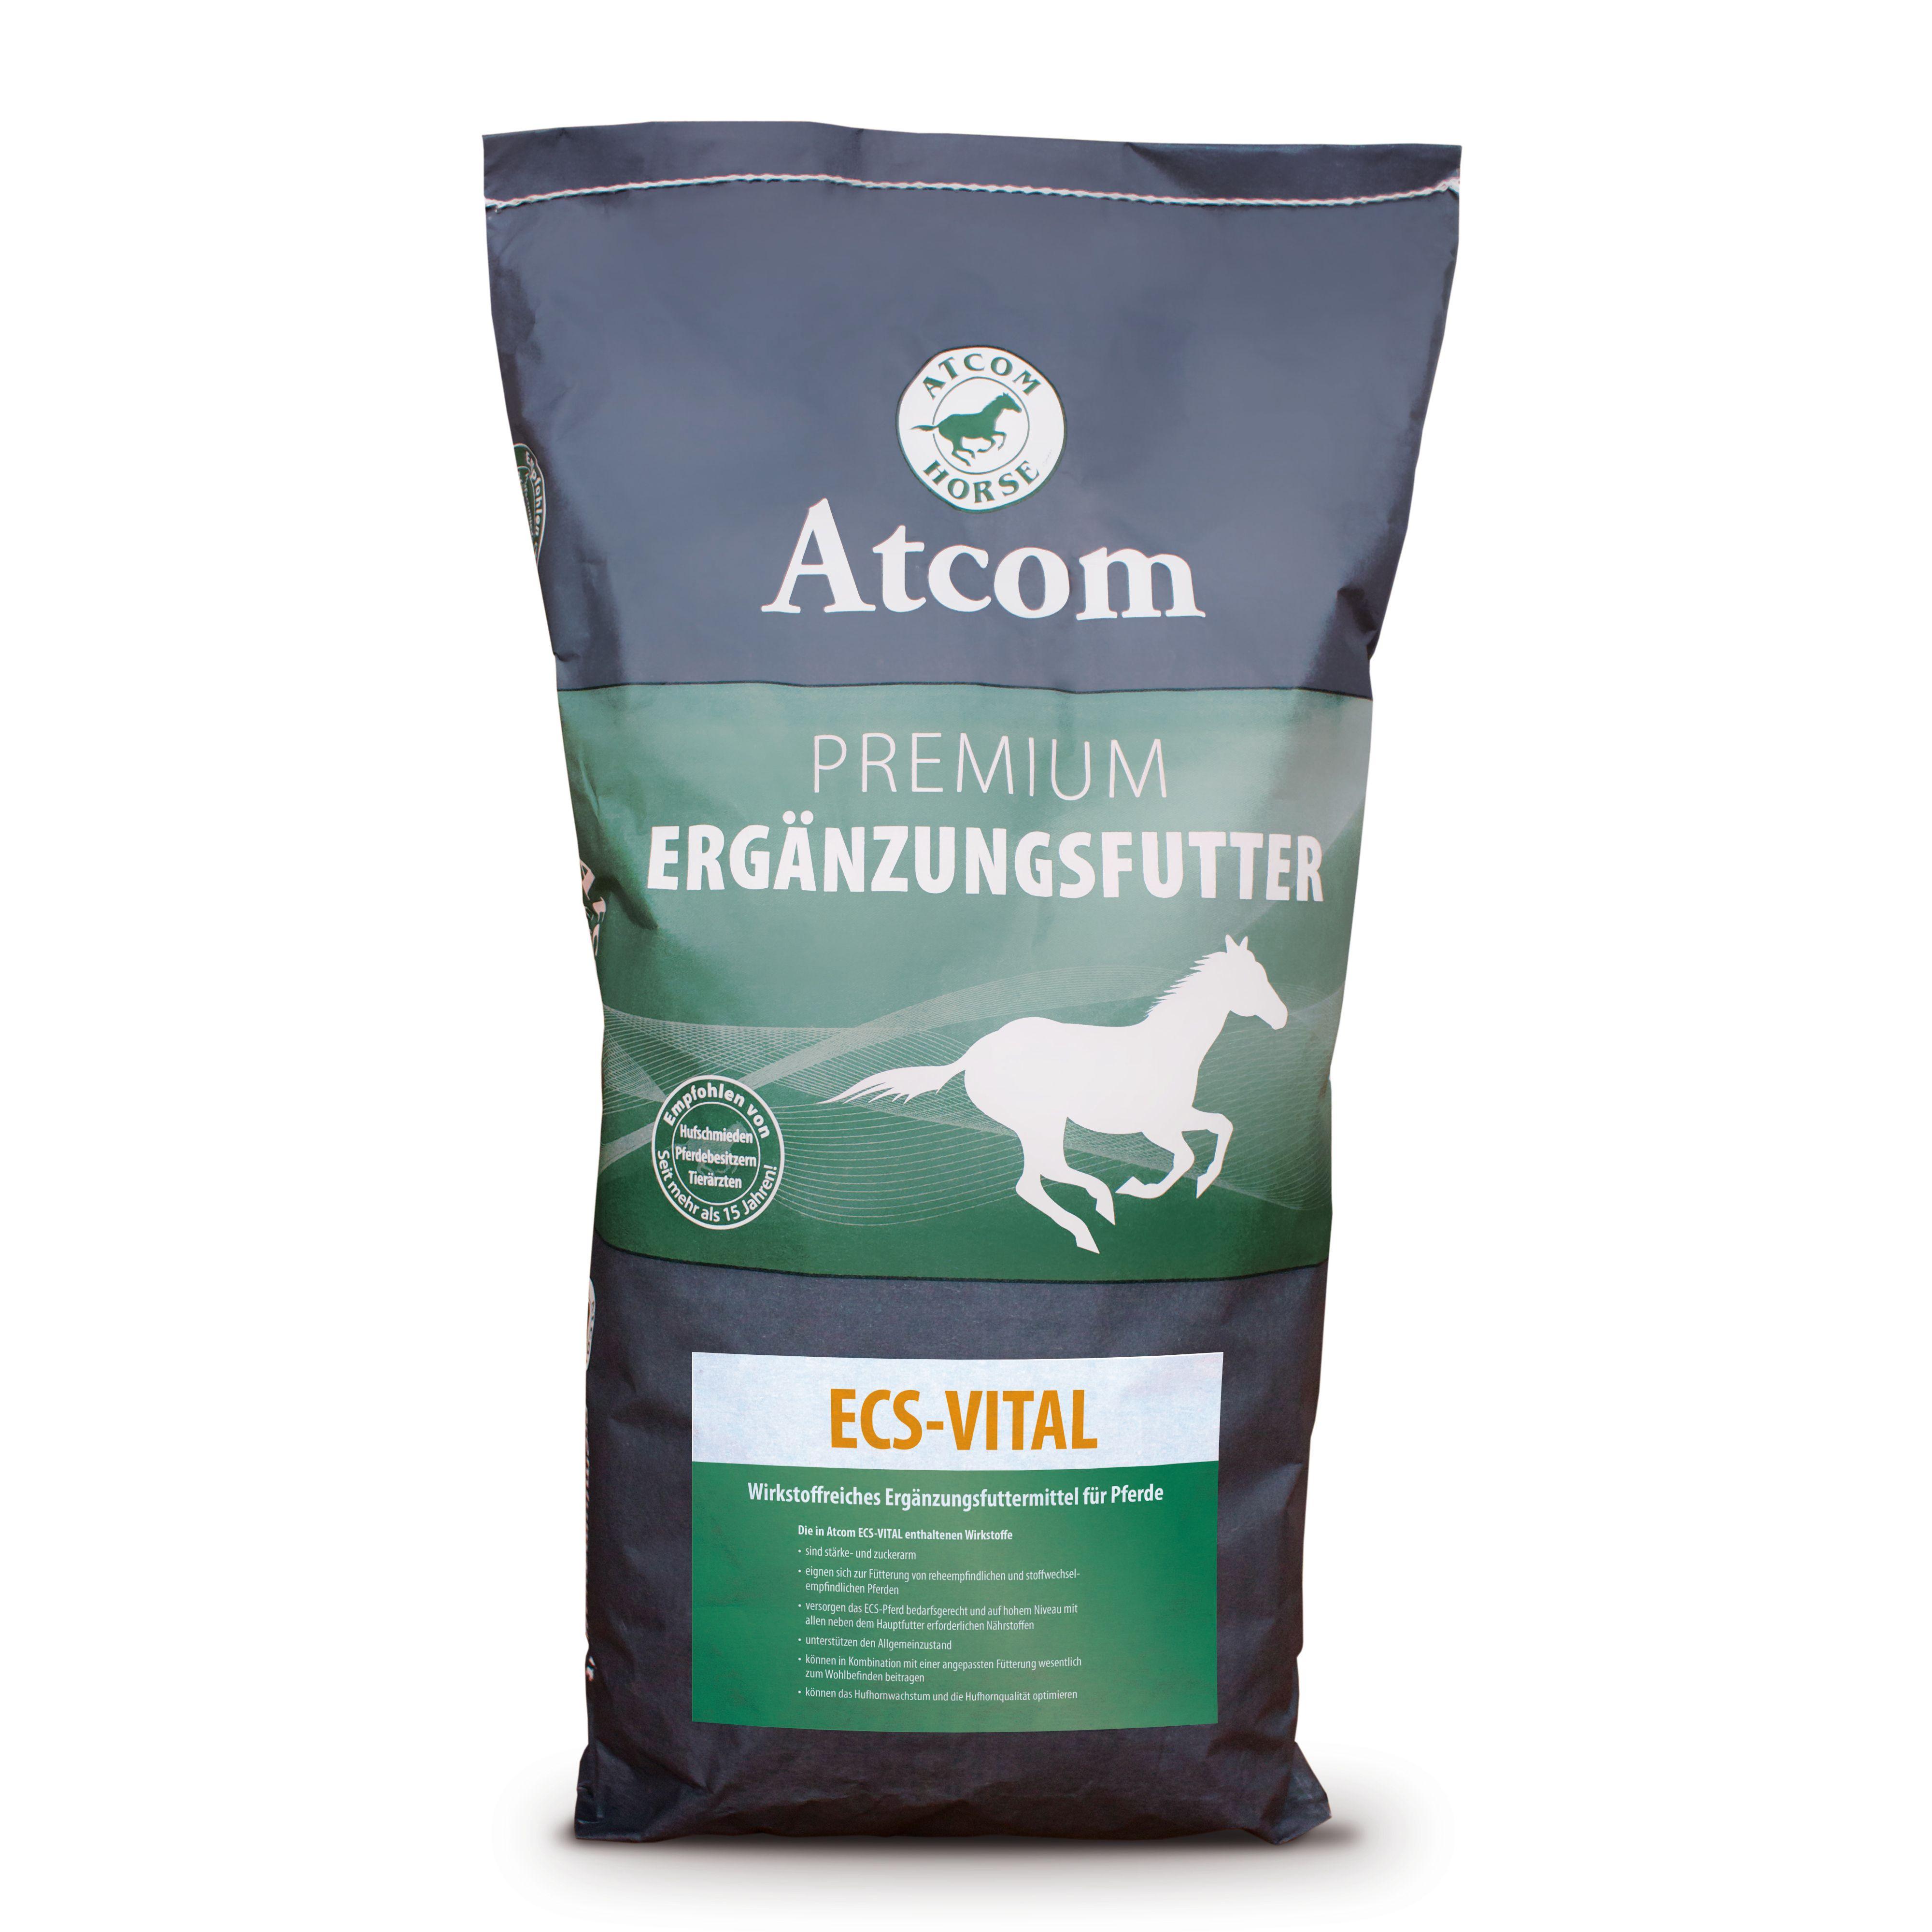 Atcom ECS-VITAL